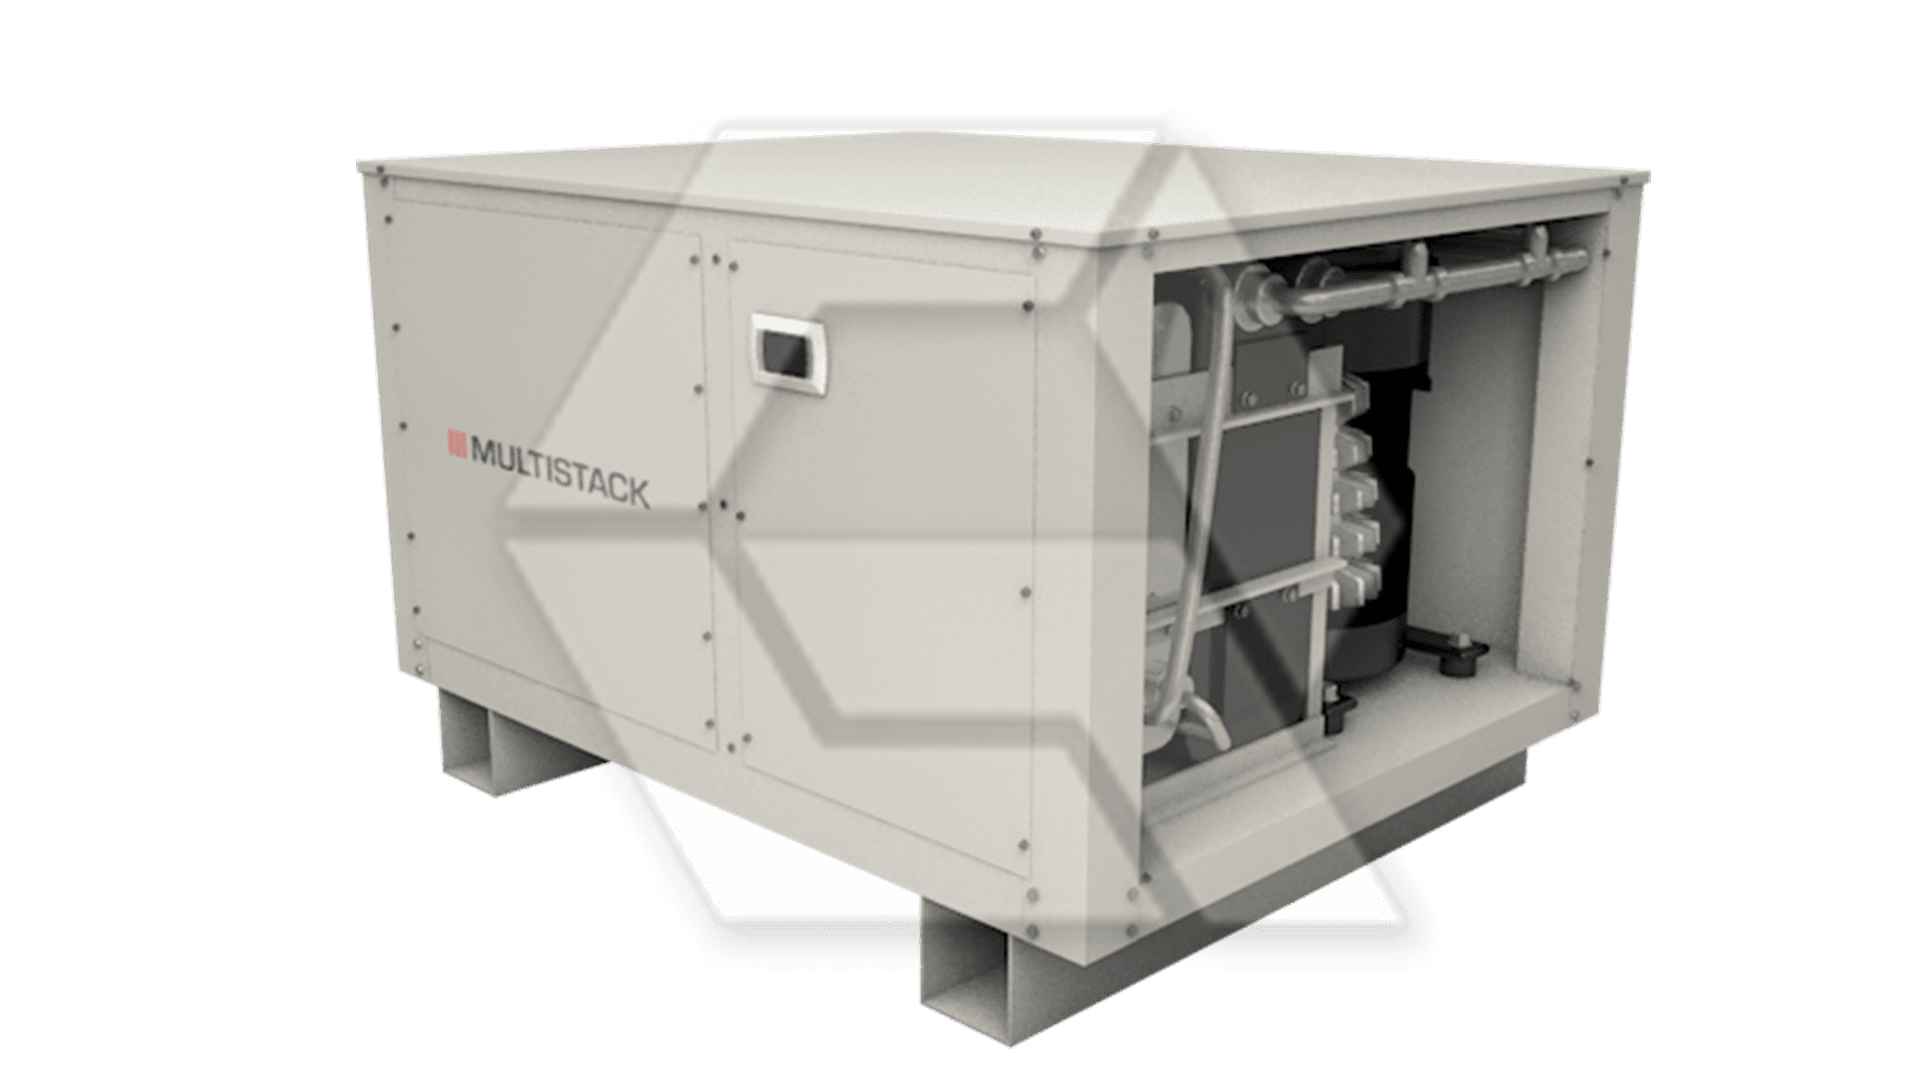 Multistack Boiler open